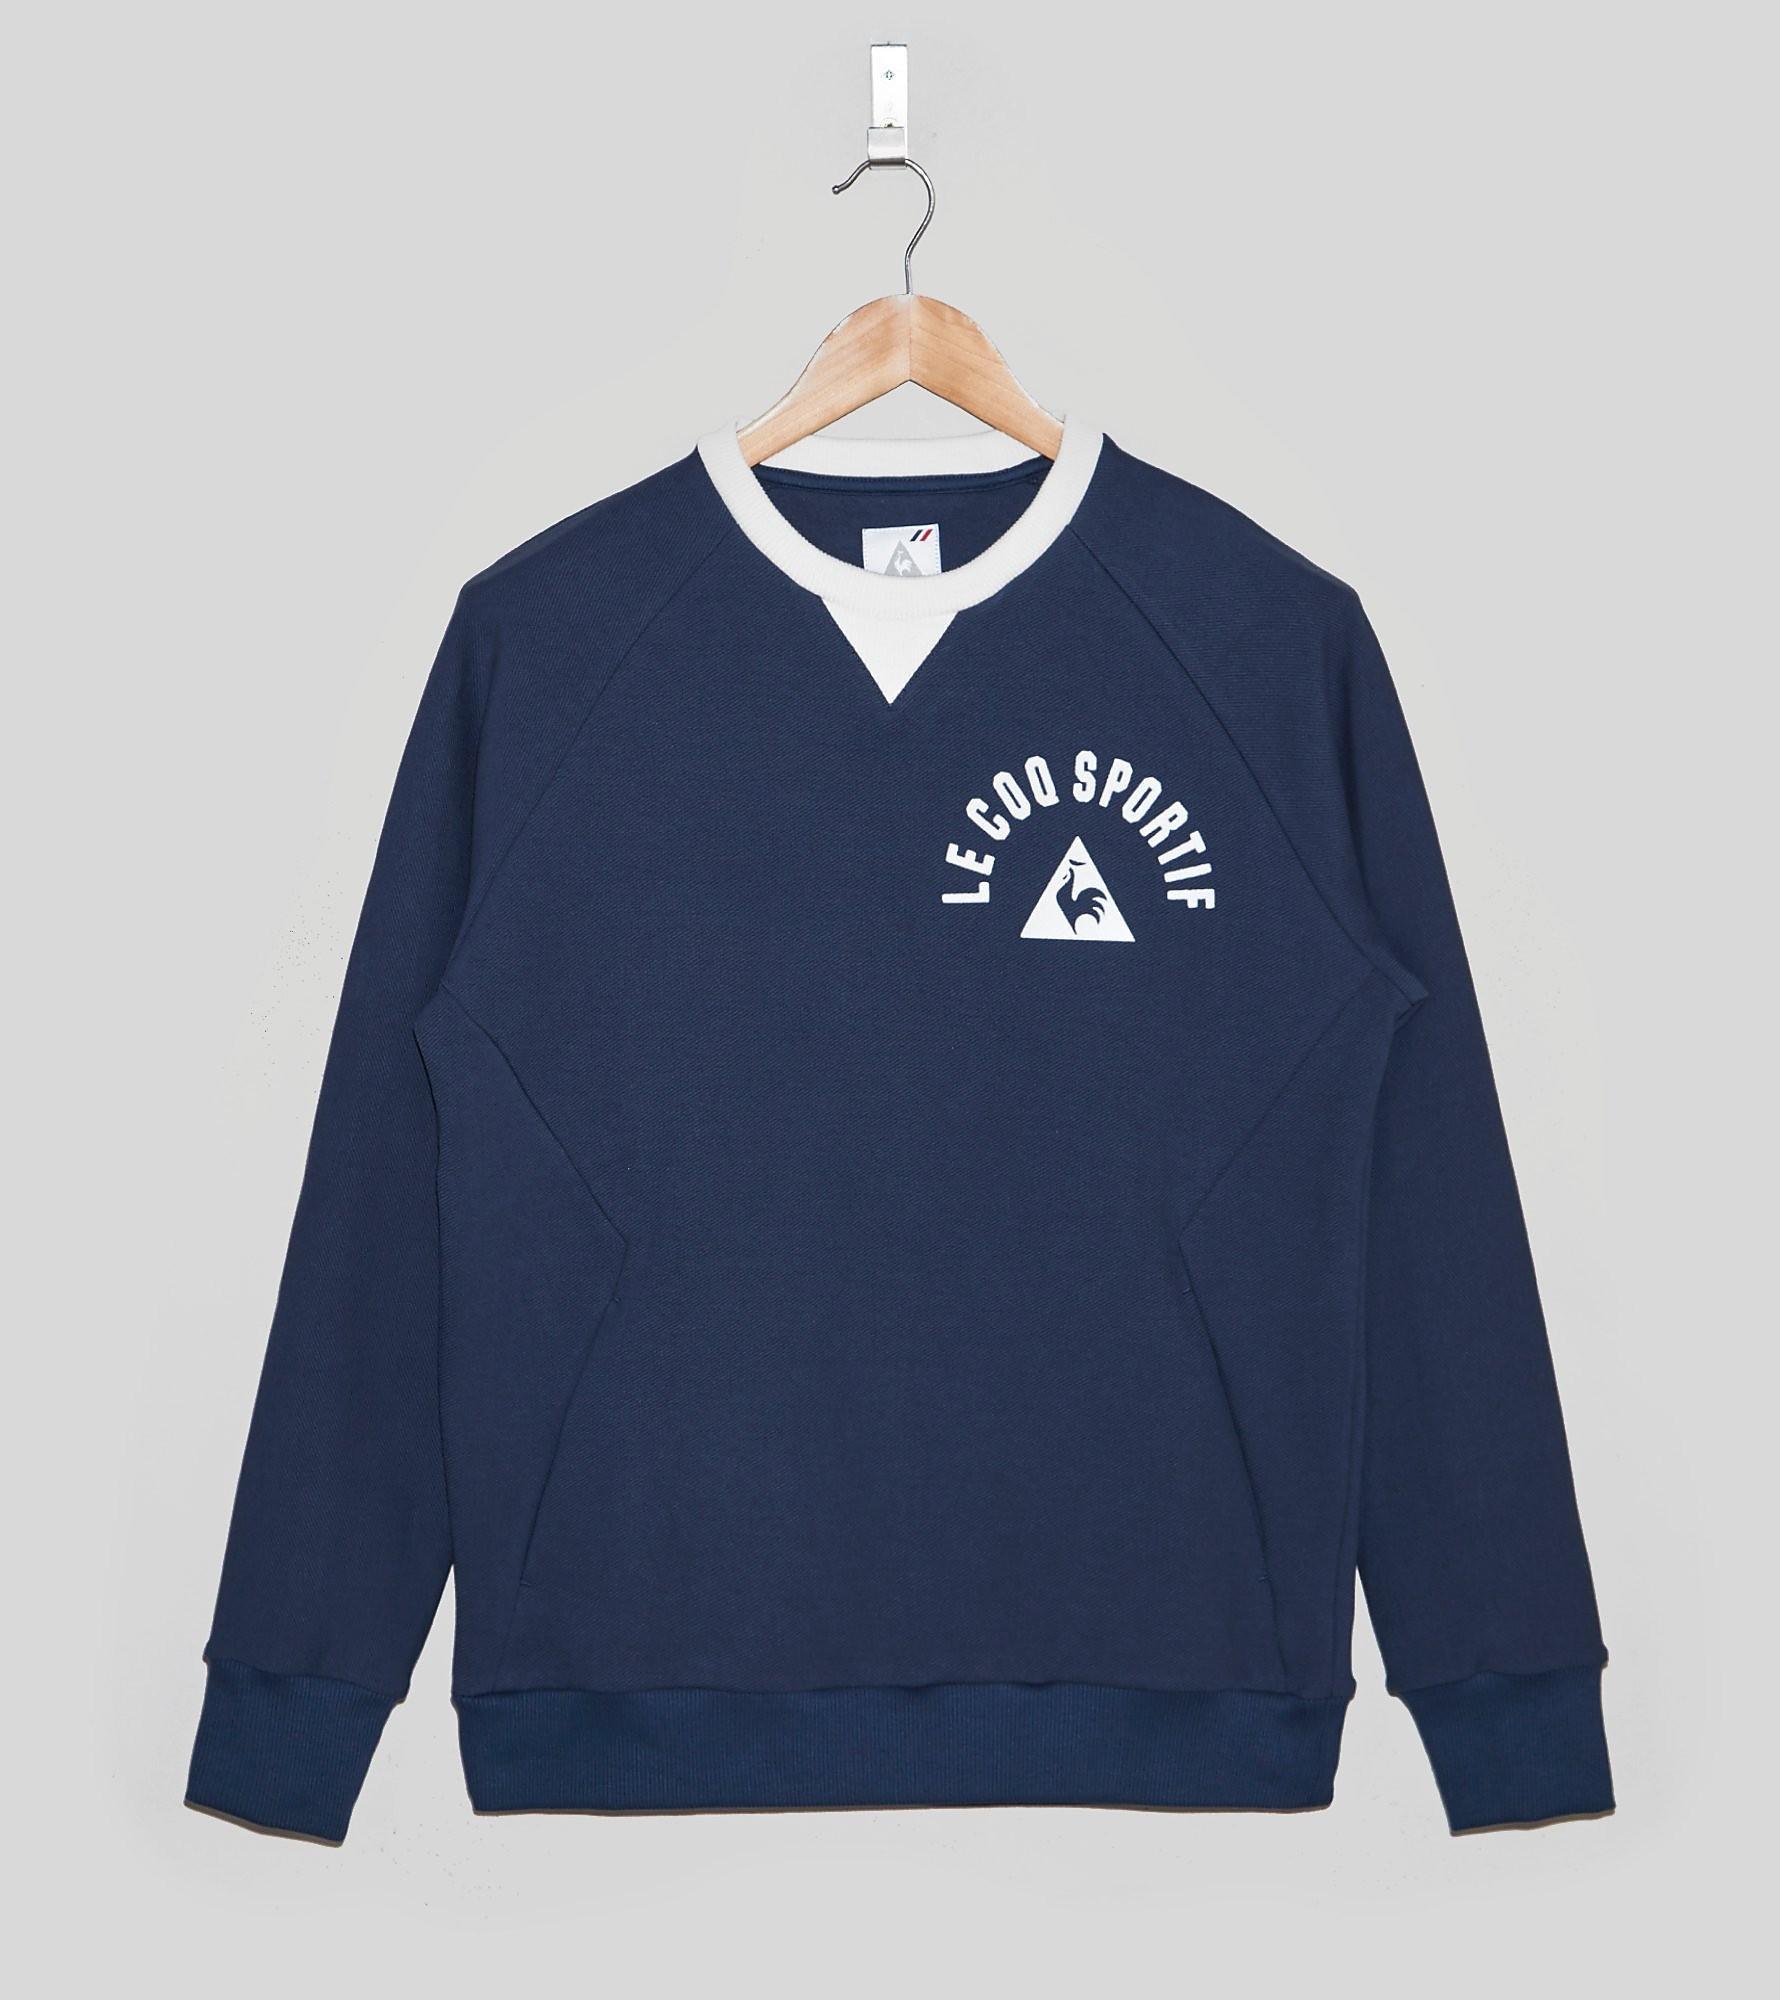 Le Coq Sportif Revival Sweatshirt